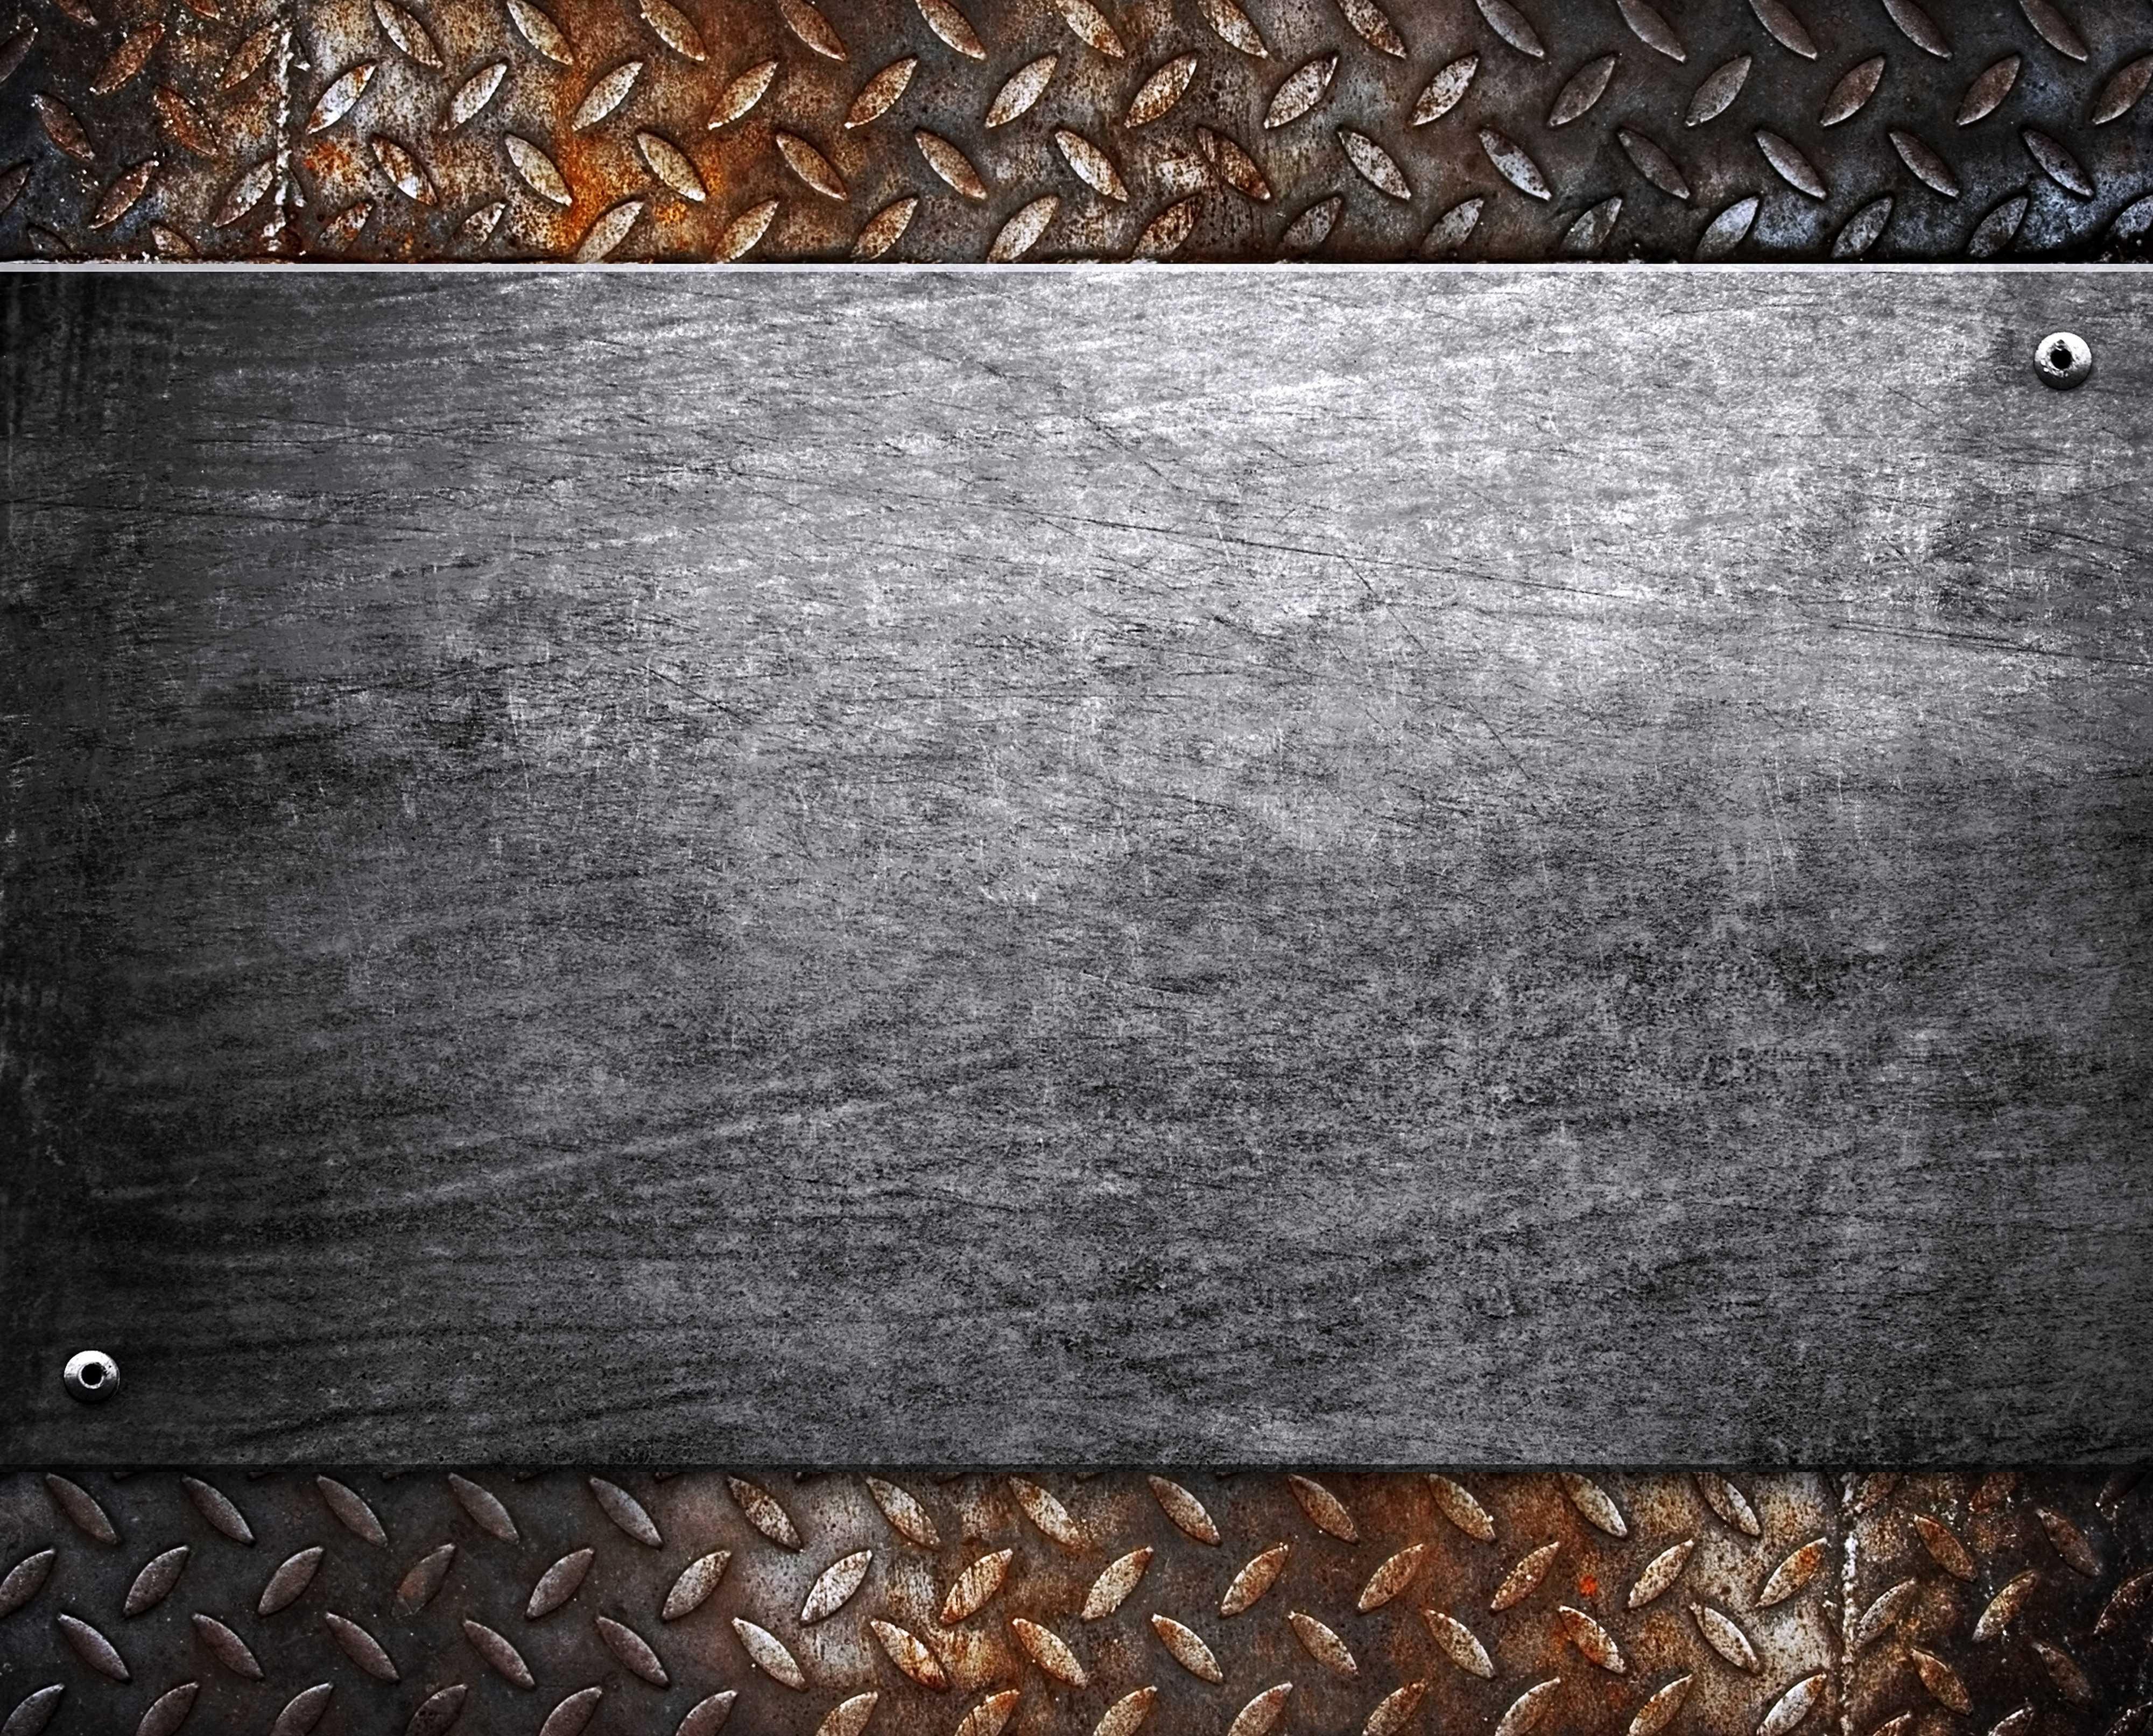 текстура метала: